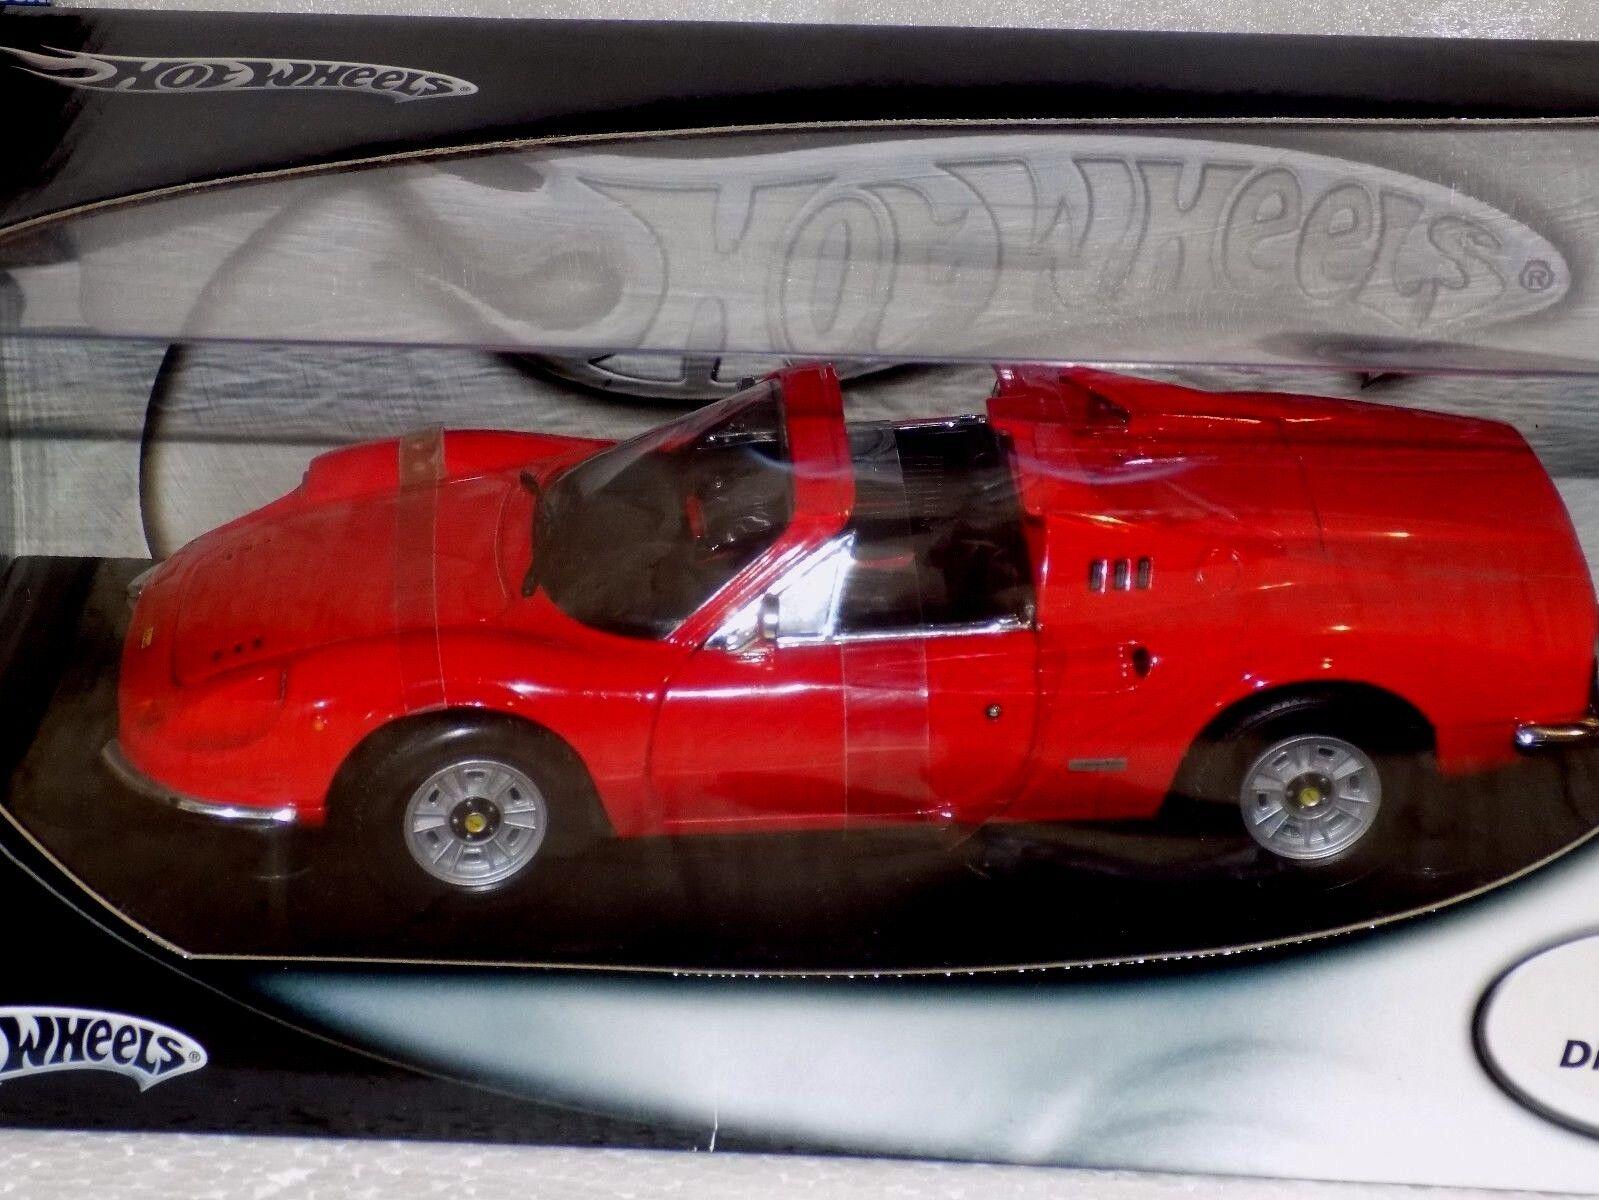 Ferrari Dino 246 GTS rosso Hotwheels 54601 1 18